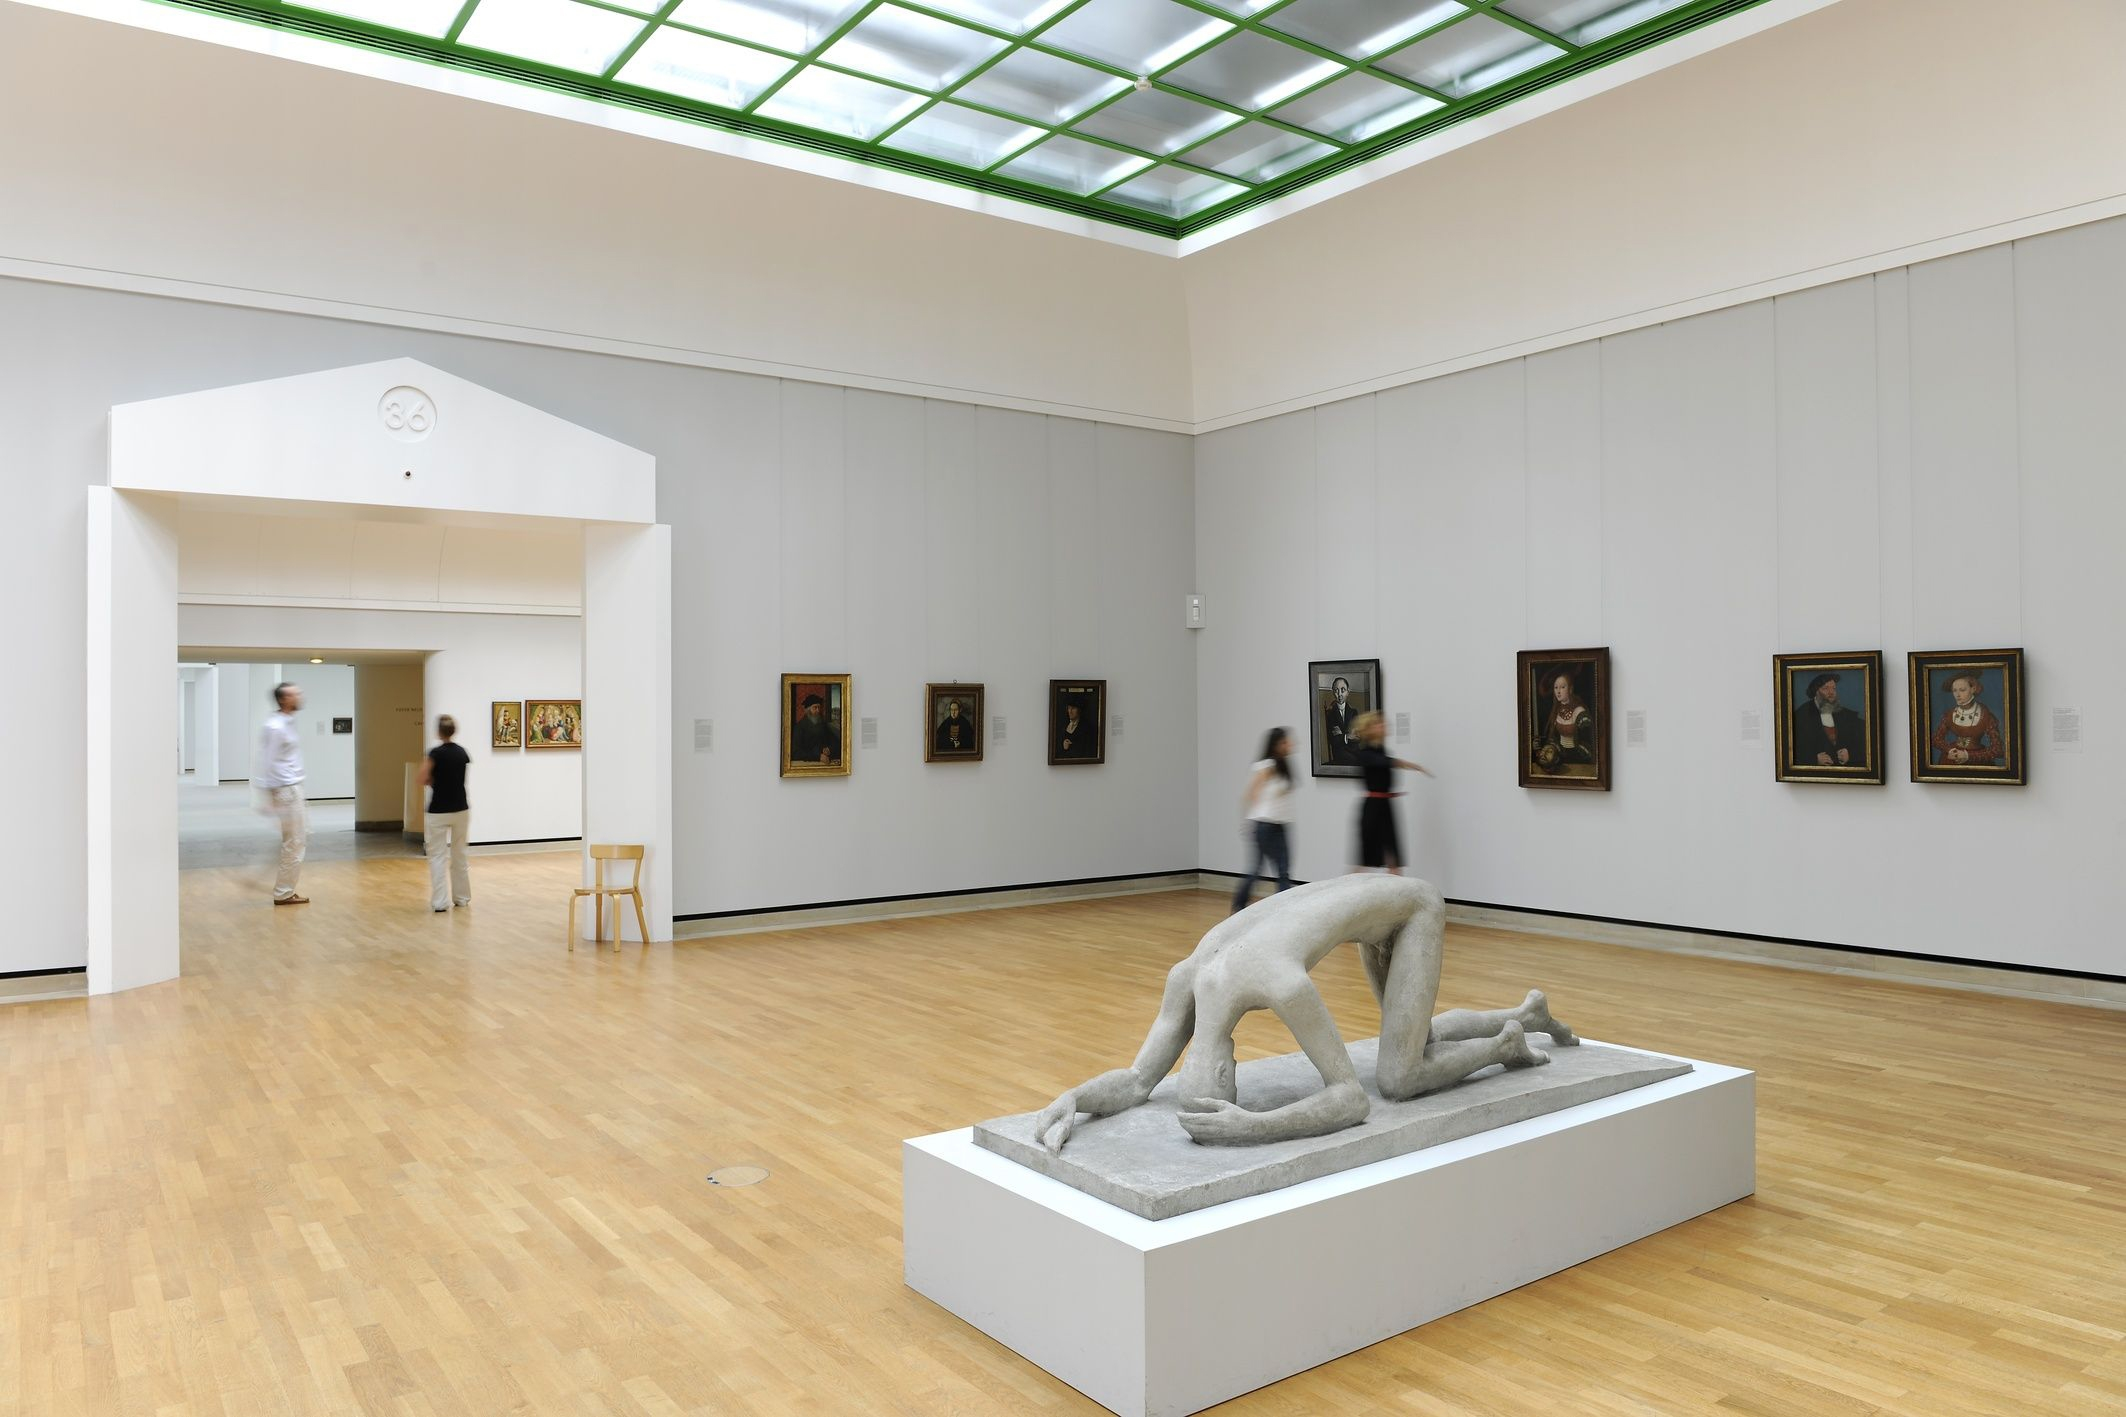 Stuttgart cuna del autom vil mercedes y porsche for Galeria stuttgart